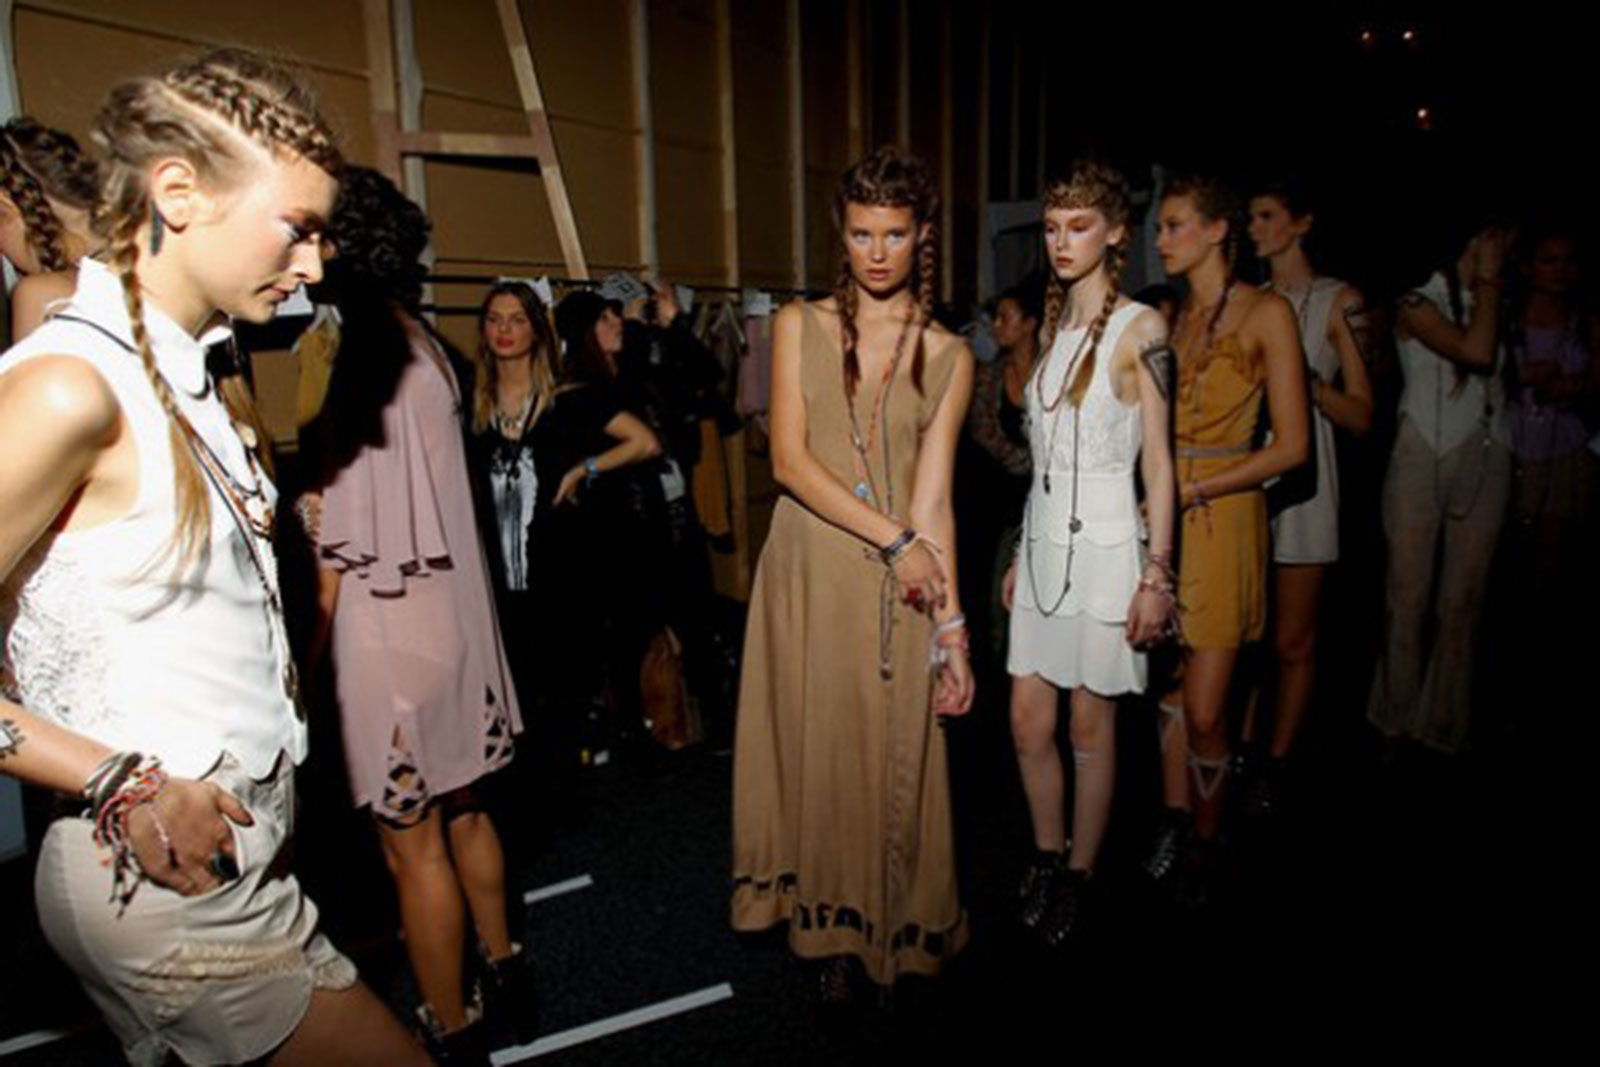 The_Ink_Collecive_Australian_Fashion_2011_33.jpg